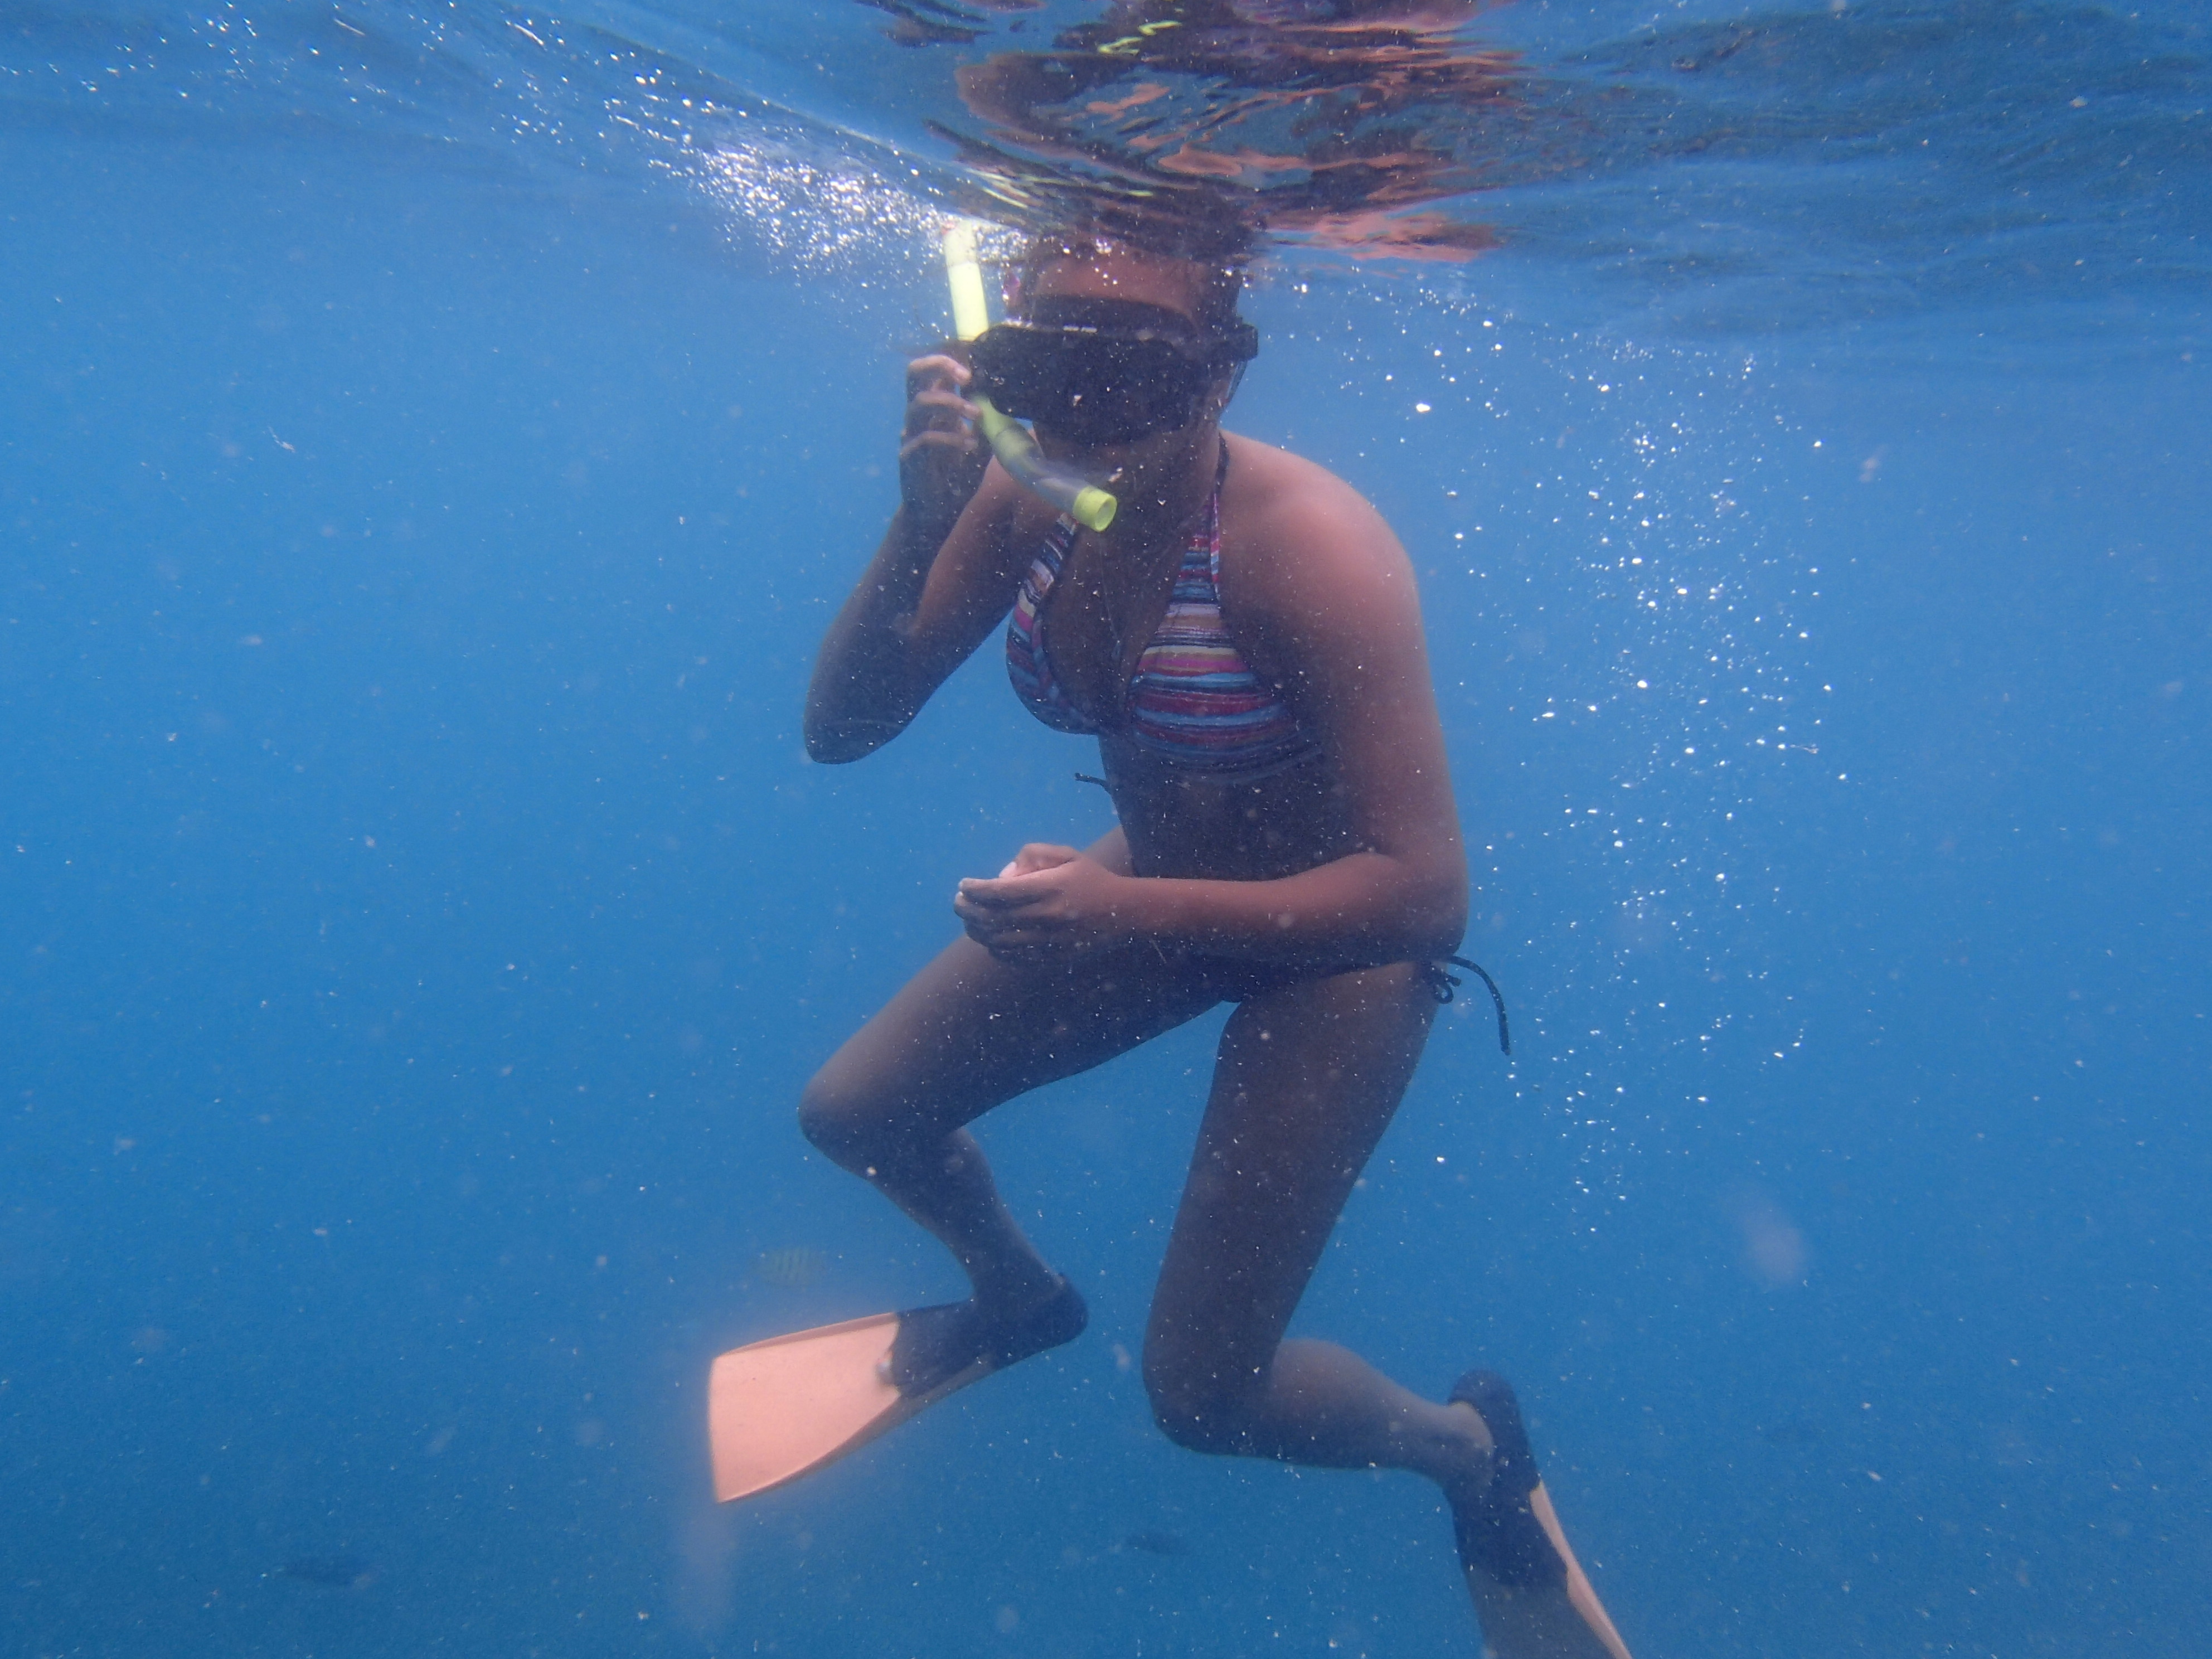 Plongée en apnée - Nomad Junkies